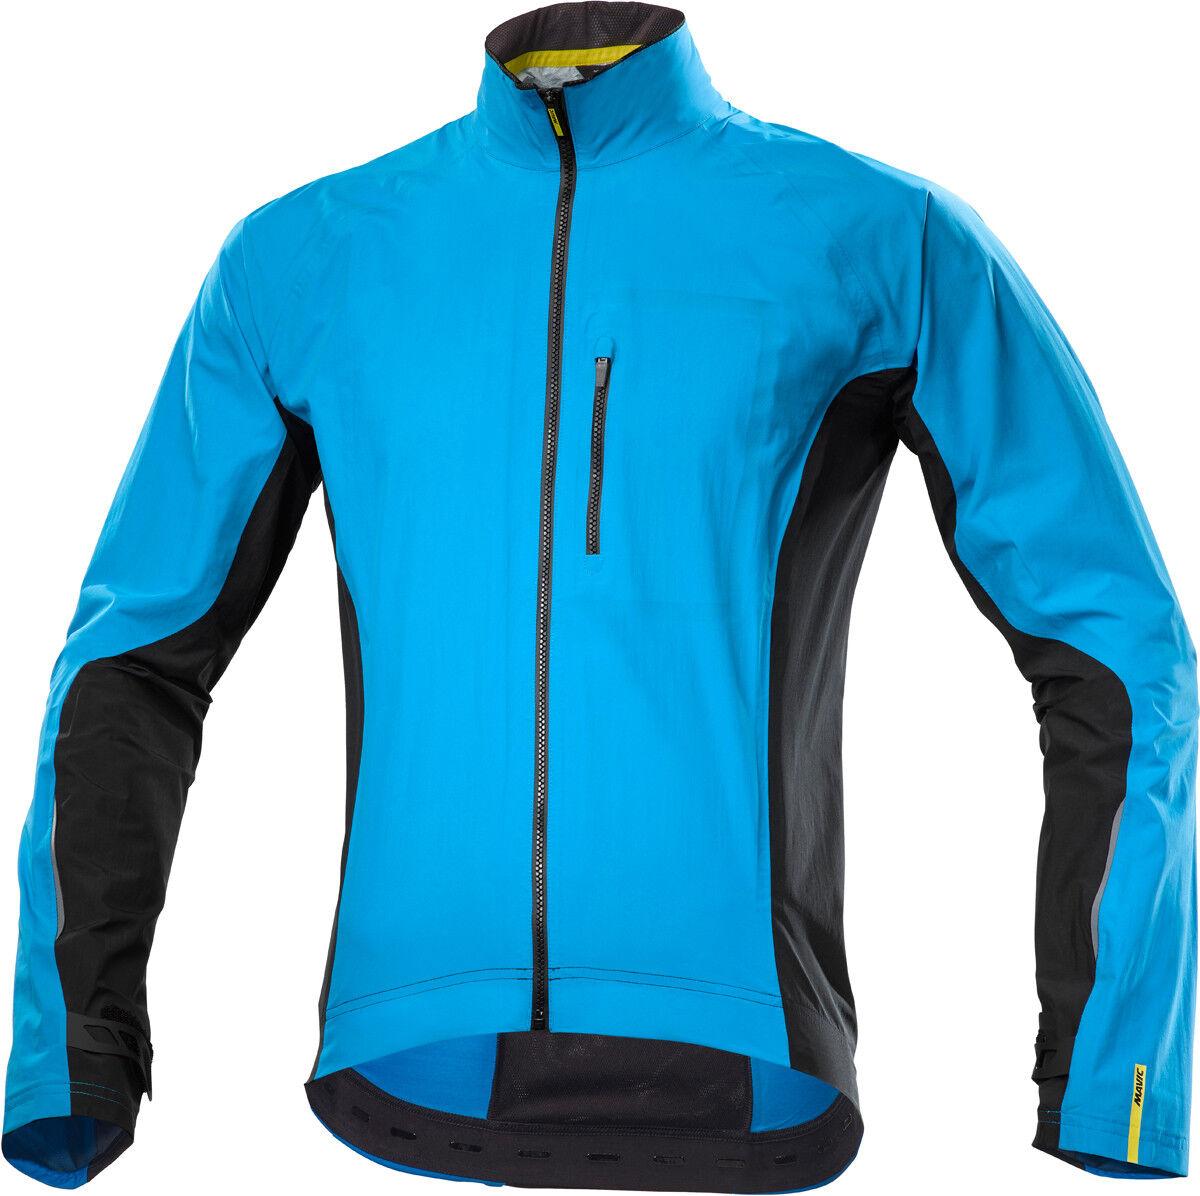 Mavic Cosmic elite h2o bicicleta chaqueta lluvia azul negro 2017